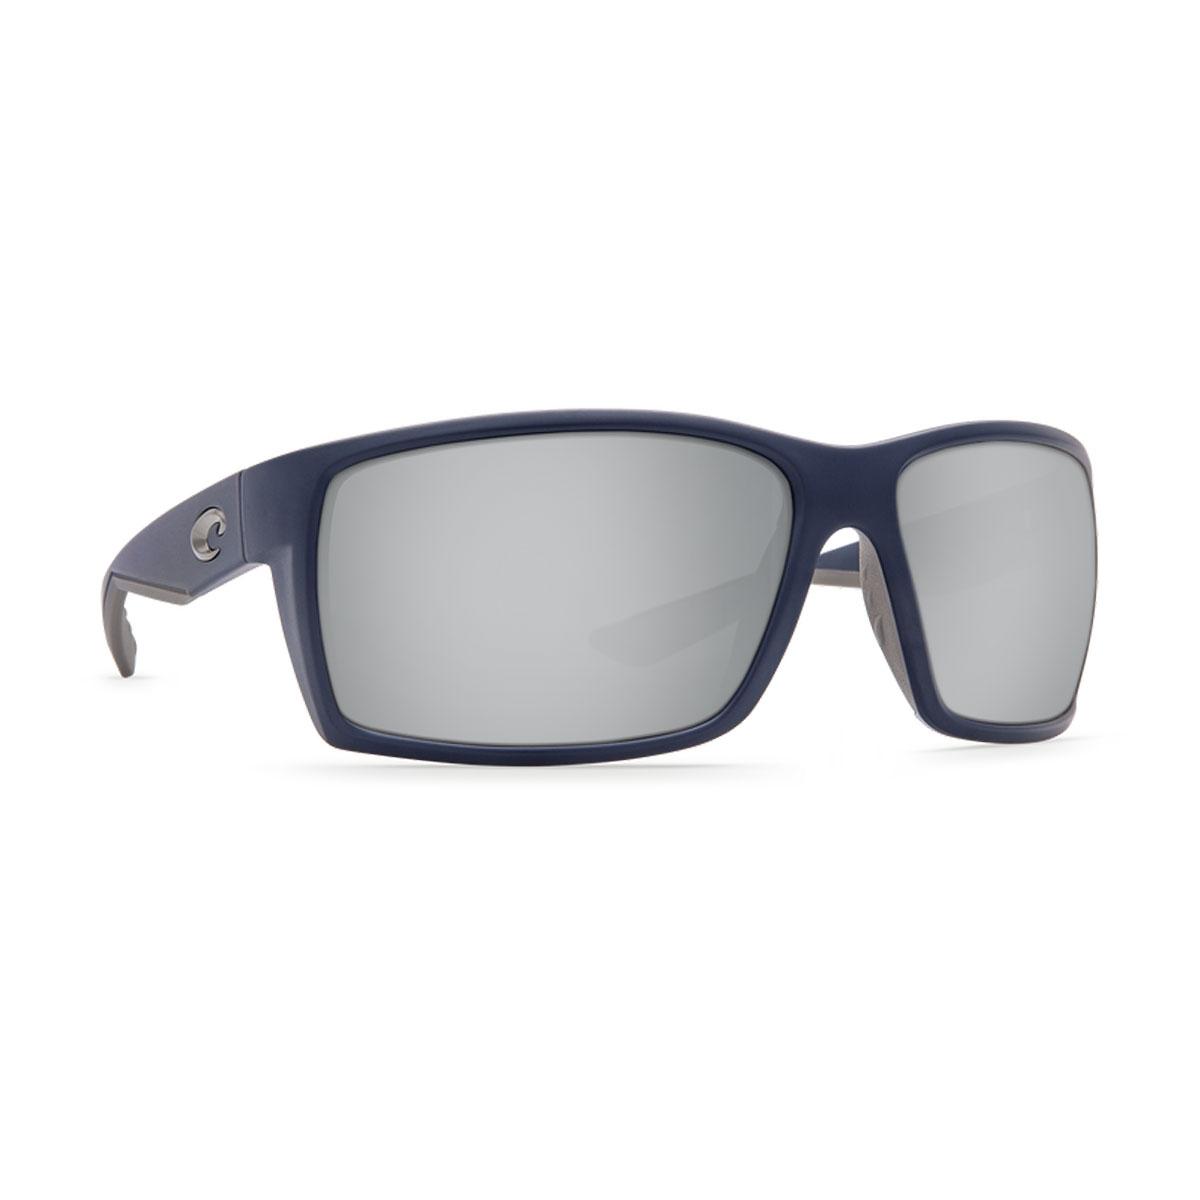 85053b08f1b Image of Costa Del Mar Reefton Sunglasses - Blue Frame - Silver 580P Lens